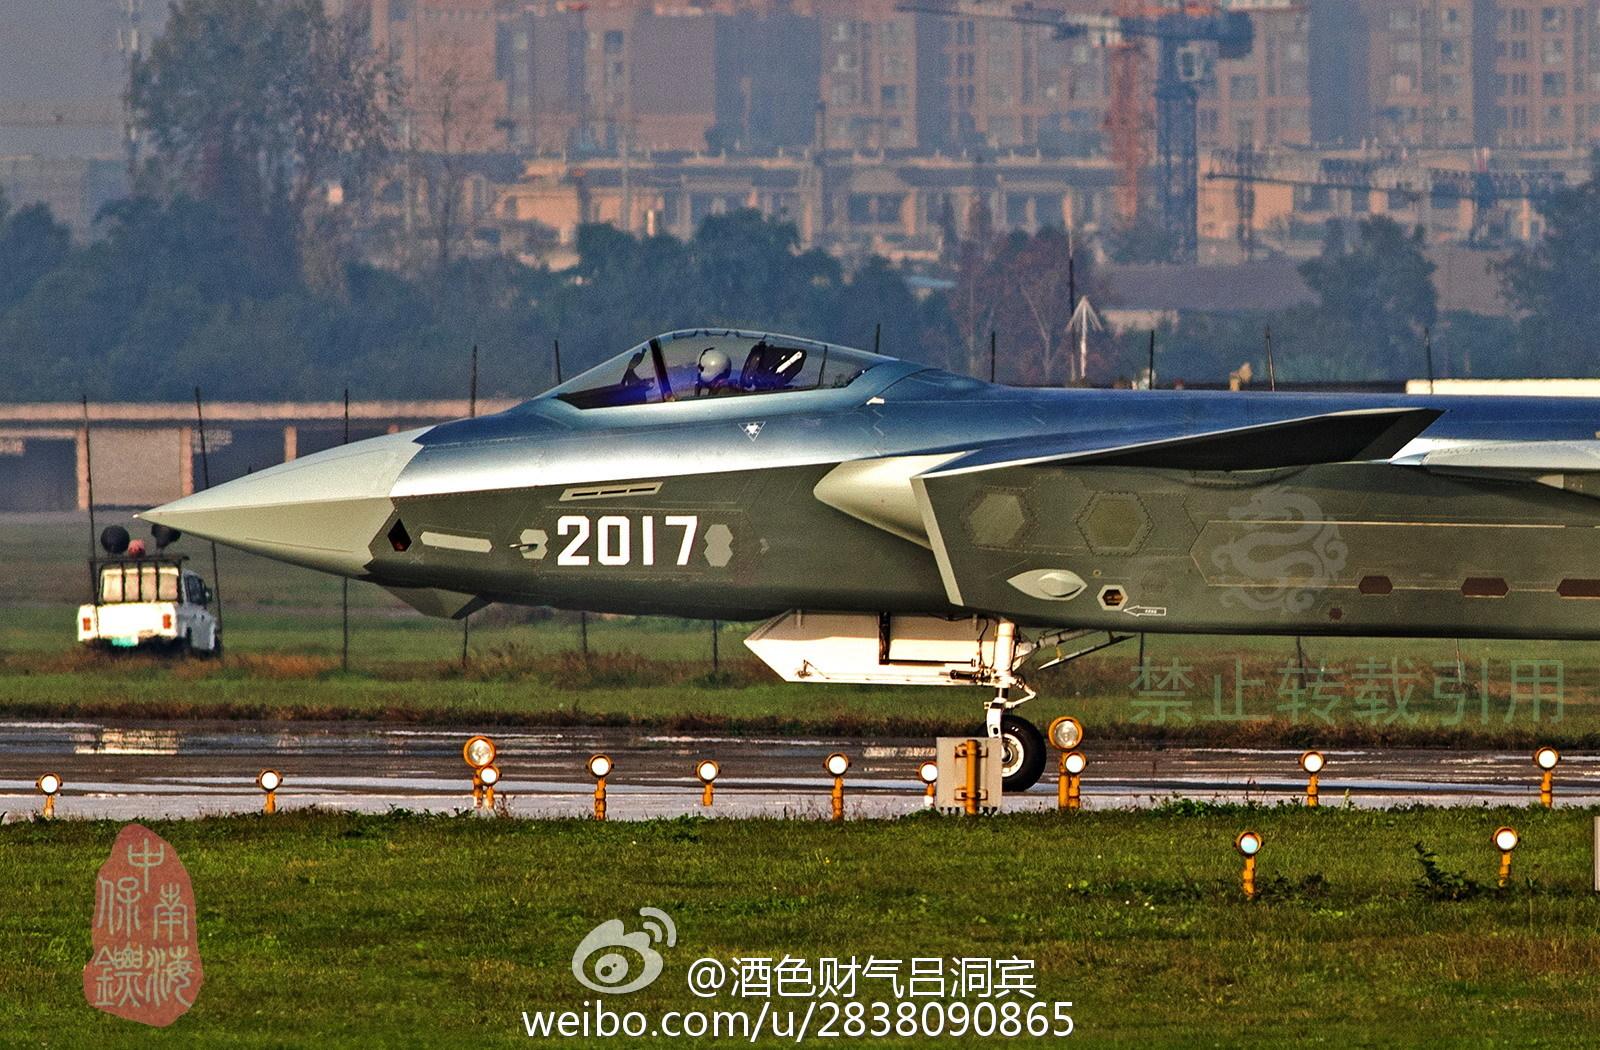 Shenyang J-31 Stealth Fighter - Page 3 A929d471gw1f0081eplq9j218g0t6k7w